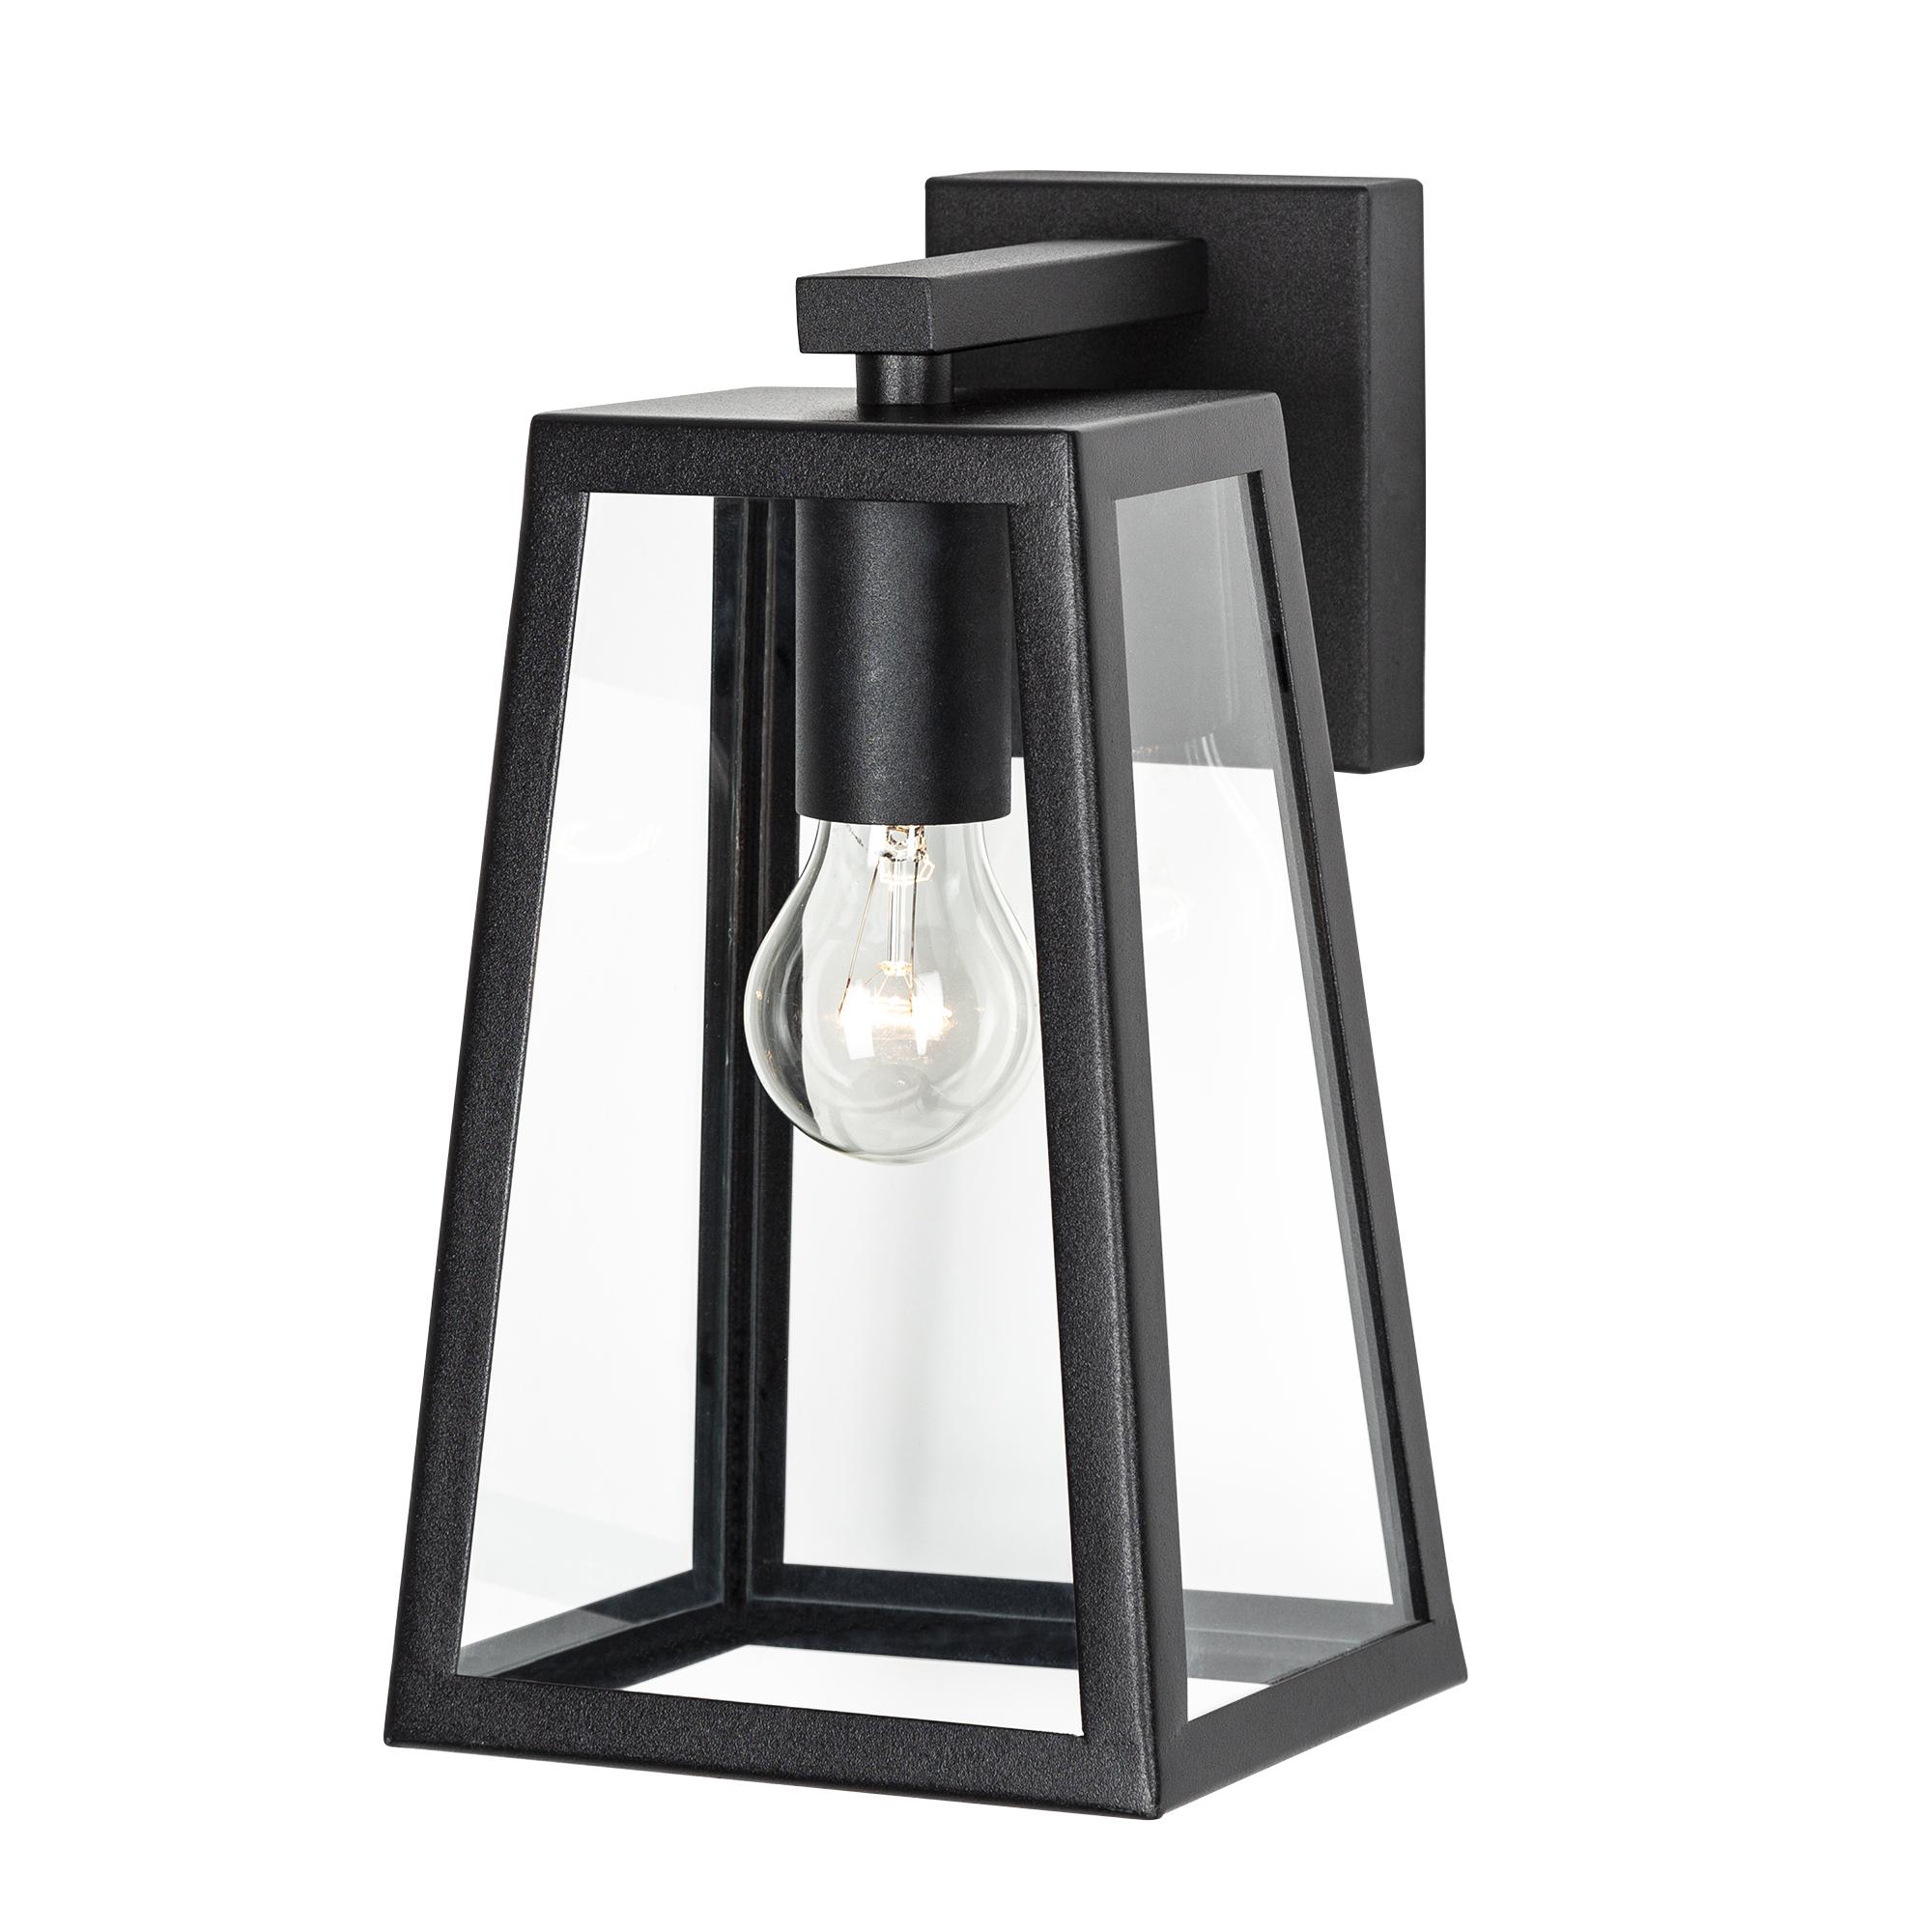 Buitenlamp Luuk Zwart Design Wandlamp